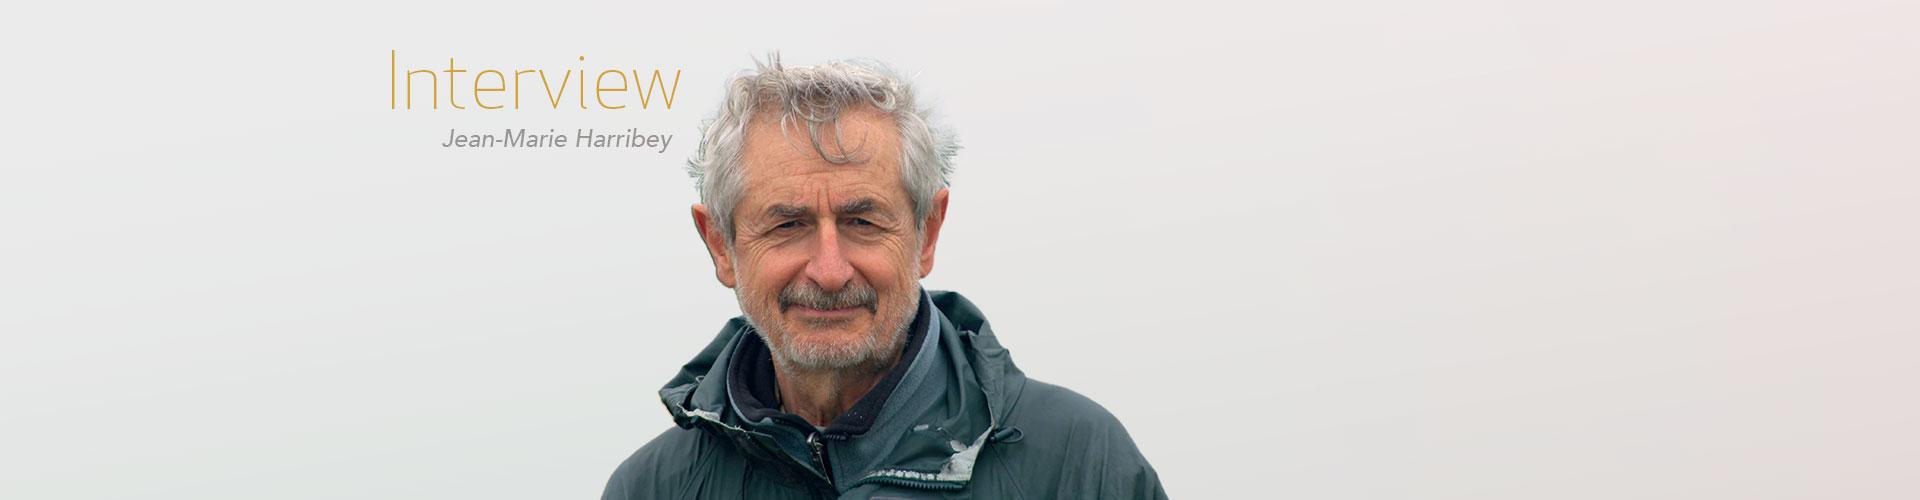 En finir avec le capitalovirus - Interview Jean-Marie Harribey